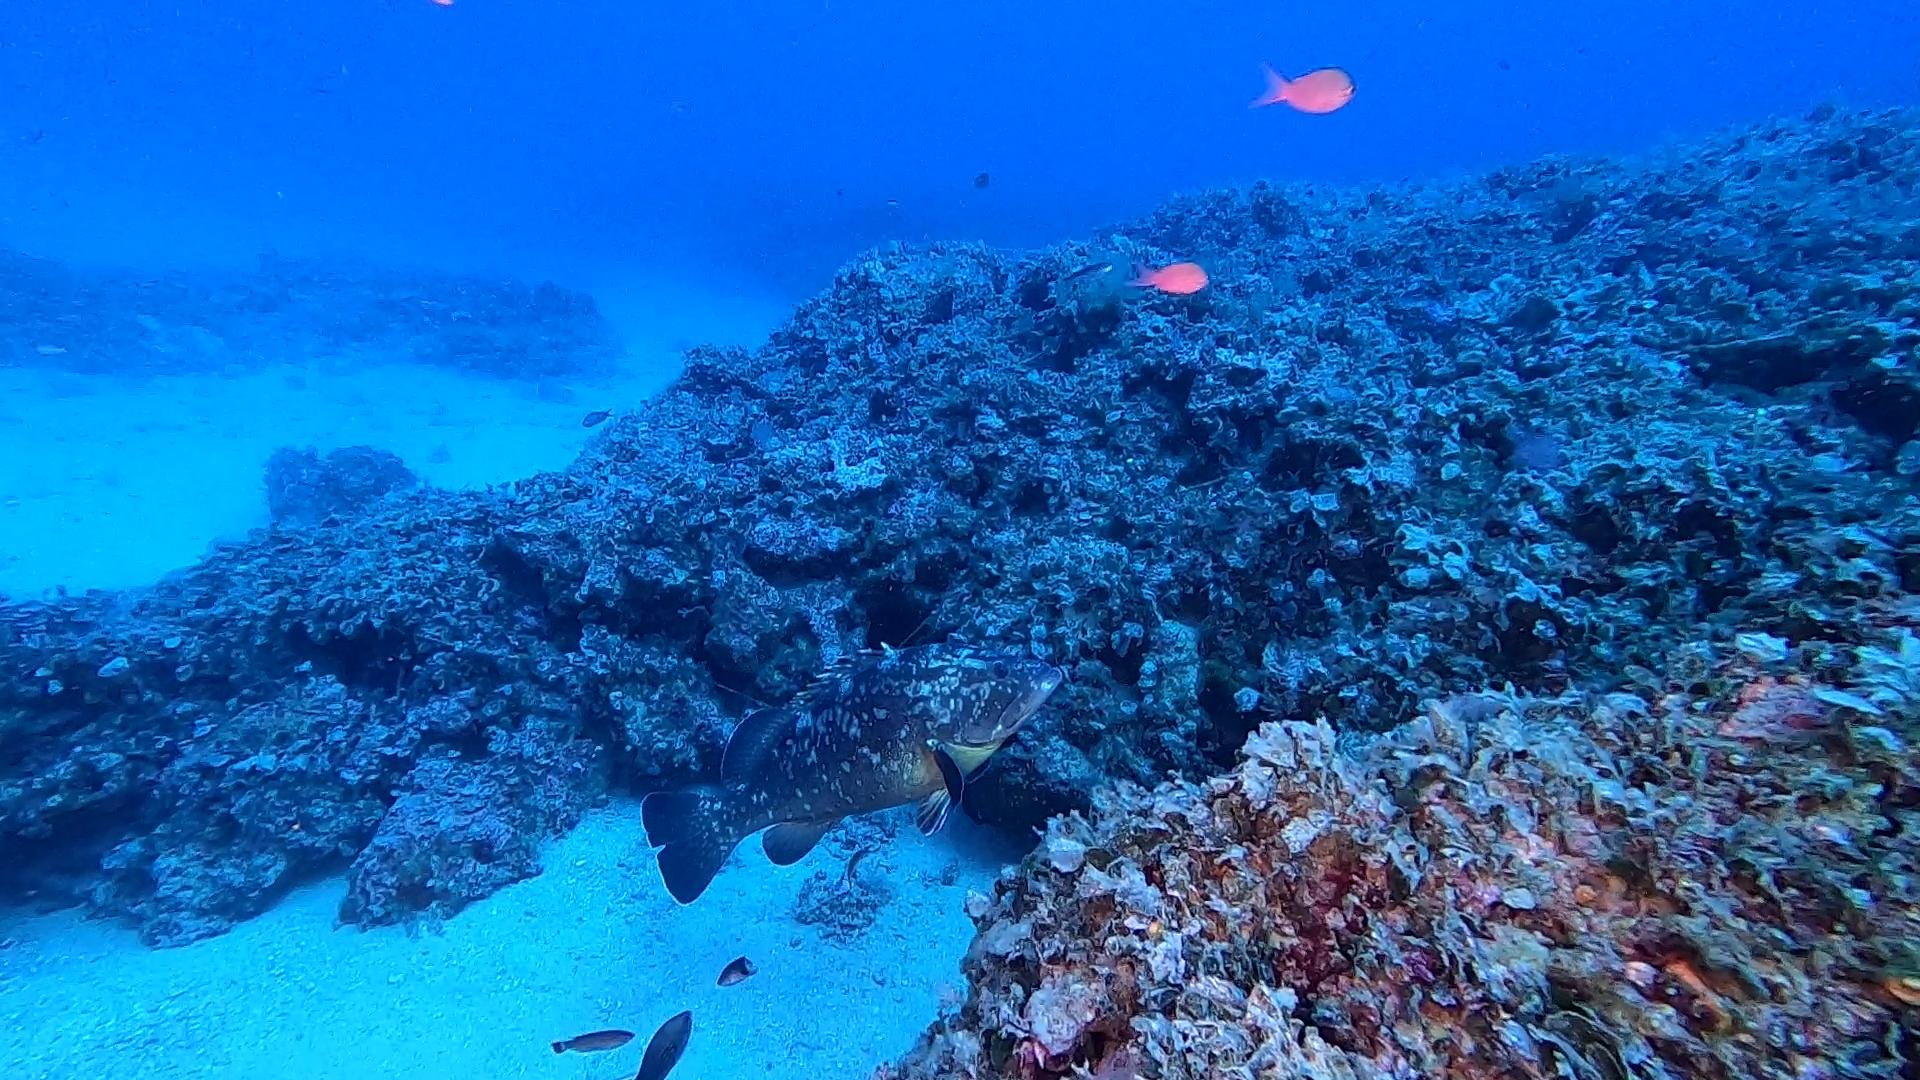 Missing Island L'Isola mancata www.intotheblue.it - Cernia Bruna Mediterranea - Dusky Grouper